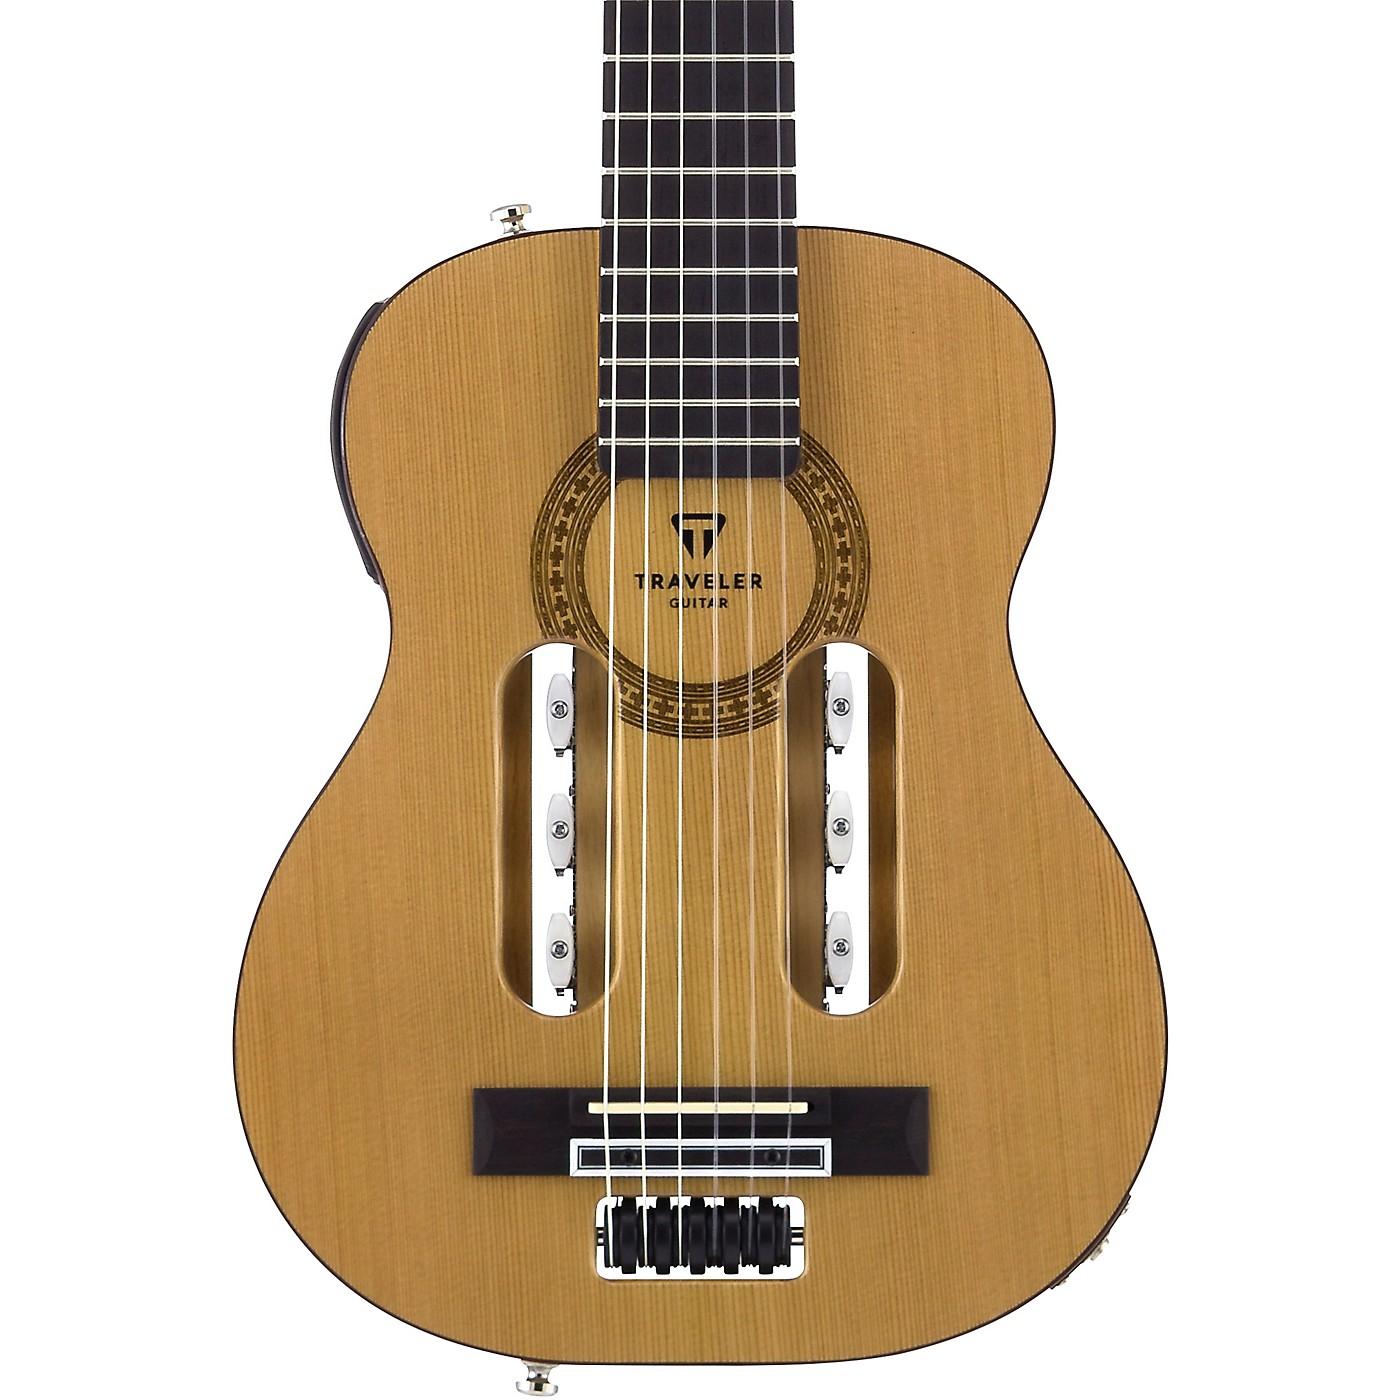 Traveler Guitar Escape Classical Nylon-String Acoustic-Electric Guitar - Woodwind & Brasswind